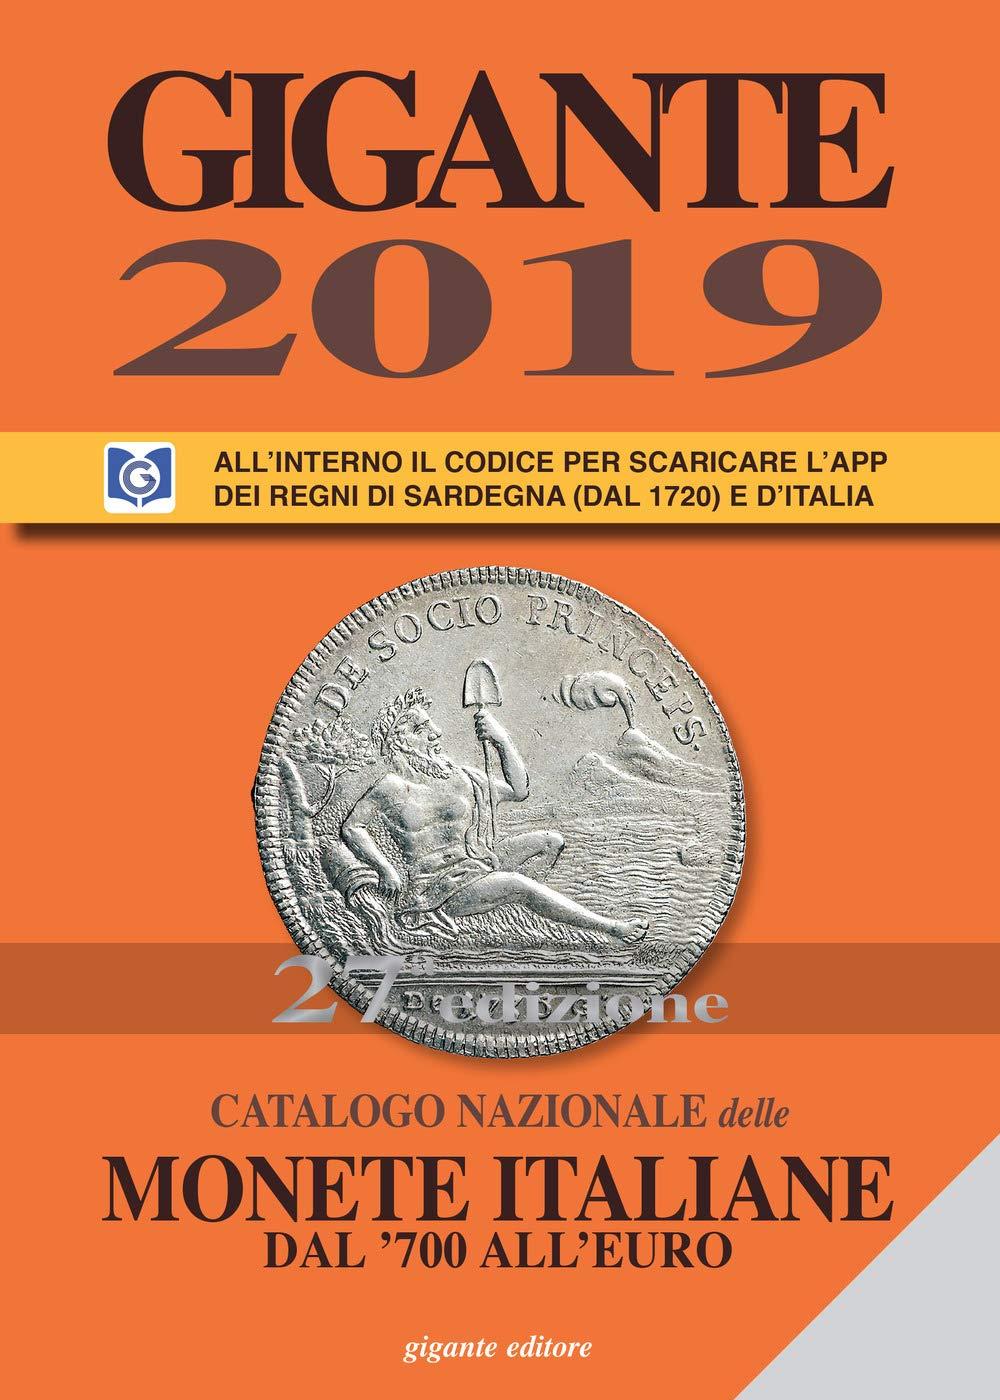 Gigante 2019. Catalogo nazionale delle monete italiane dal 700 alleuro: Amazon.es: Gigante, Fabio: Libros en idiomas extranjeros